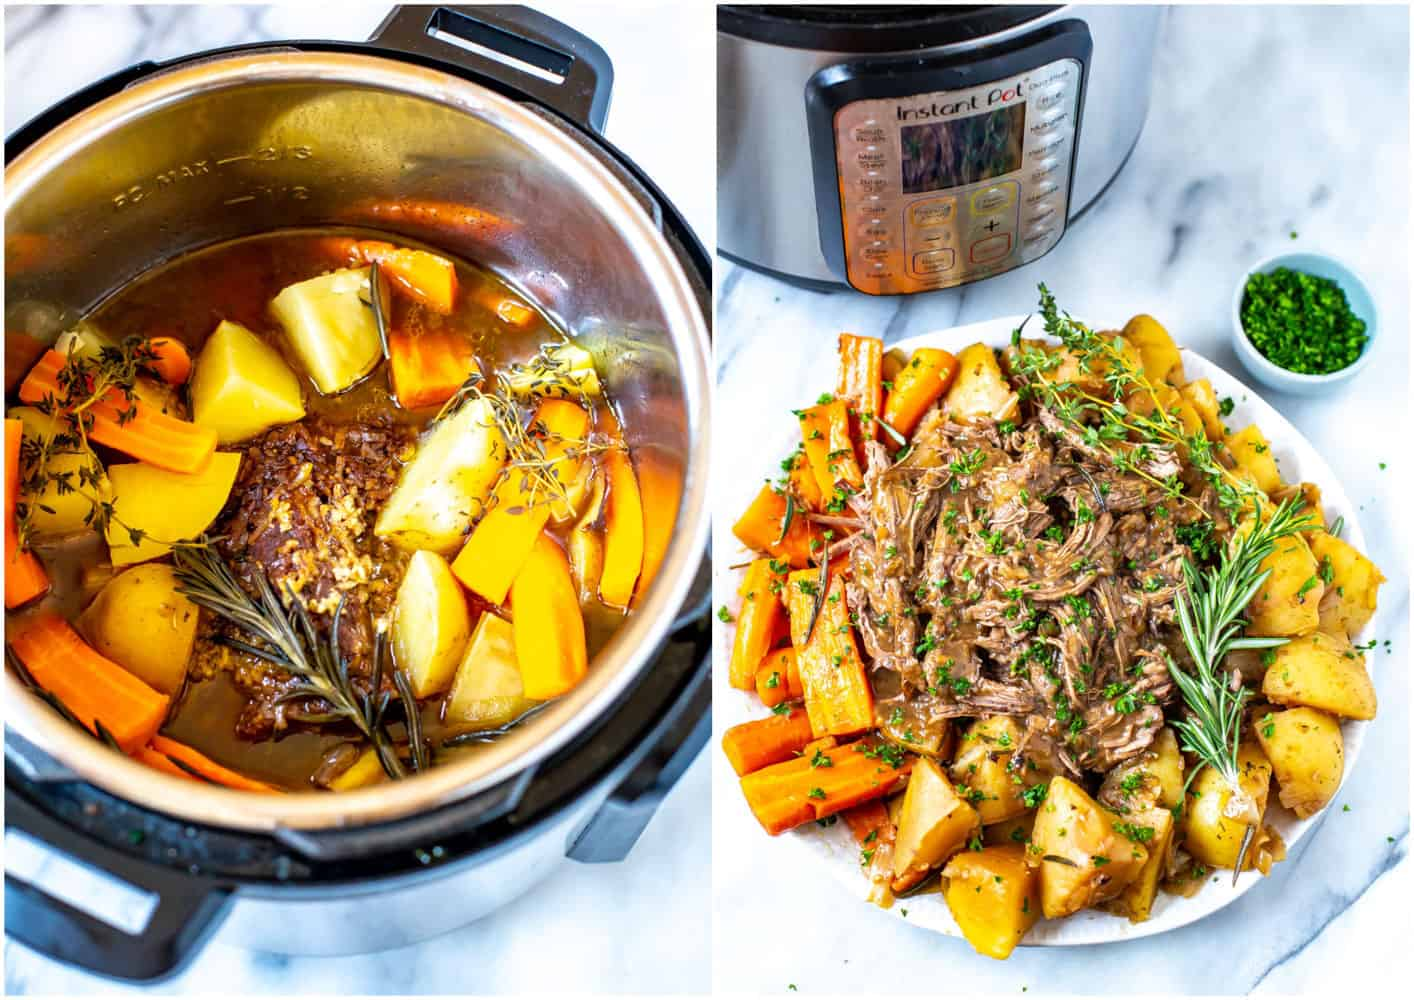 The Ultimate Instant Pot Pot Roast